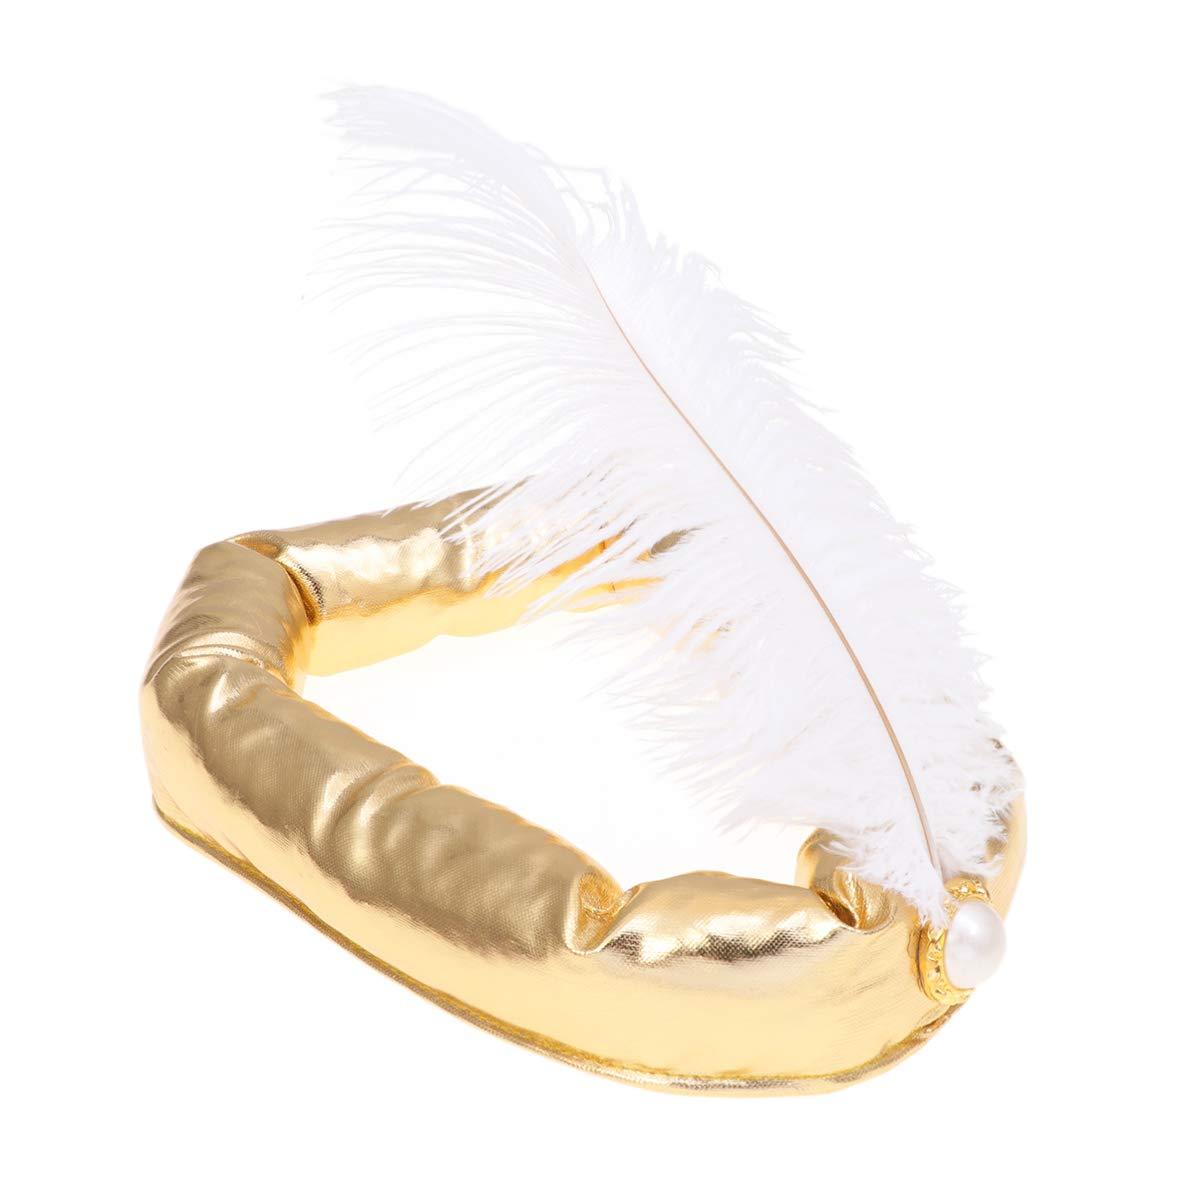 Amosfun Arabian Hat Halloween Feather Sultan Prince Hat Sultan Costume Cosplay Headband Golden